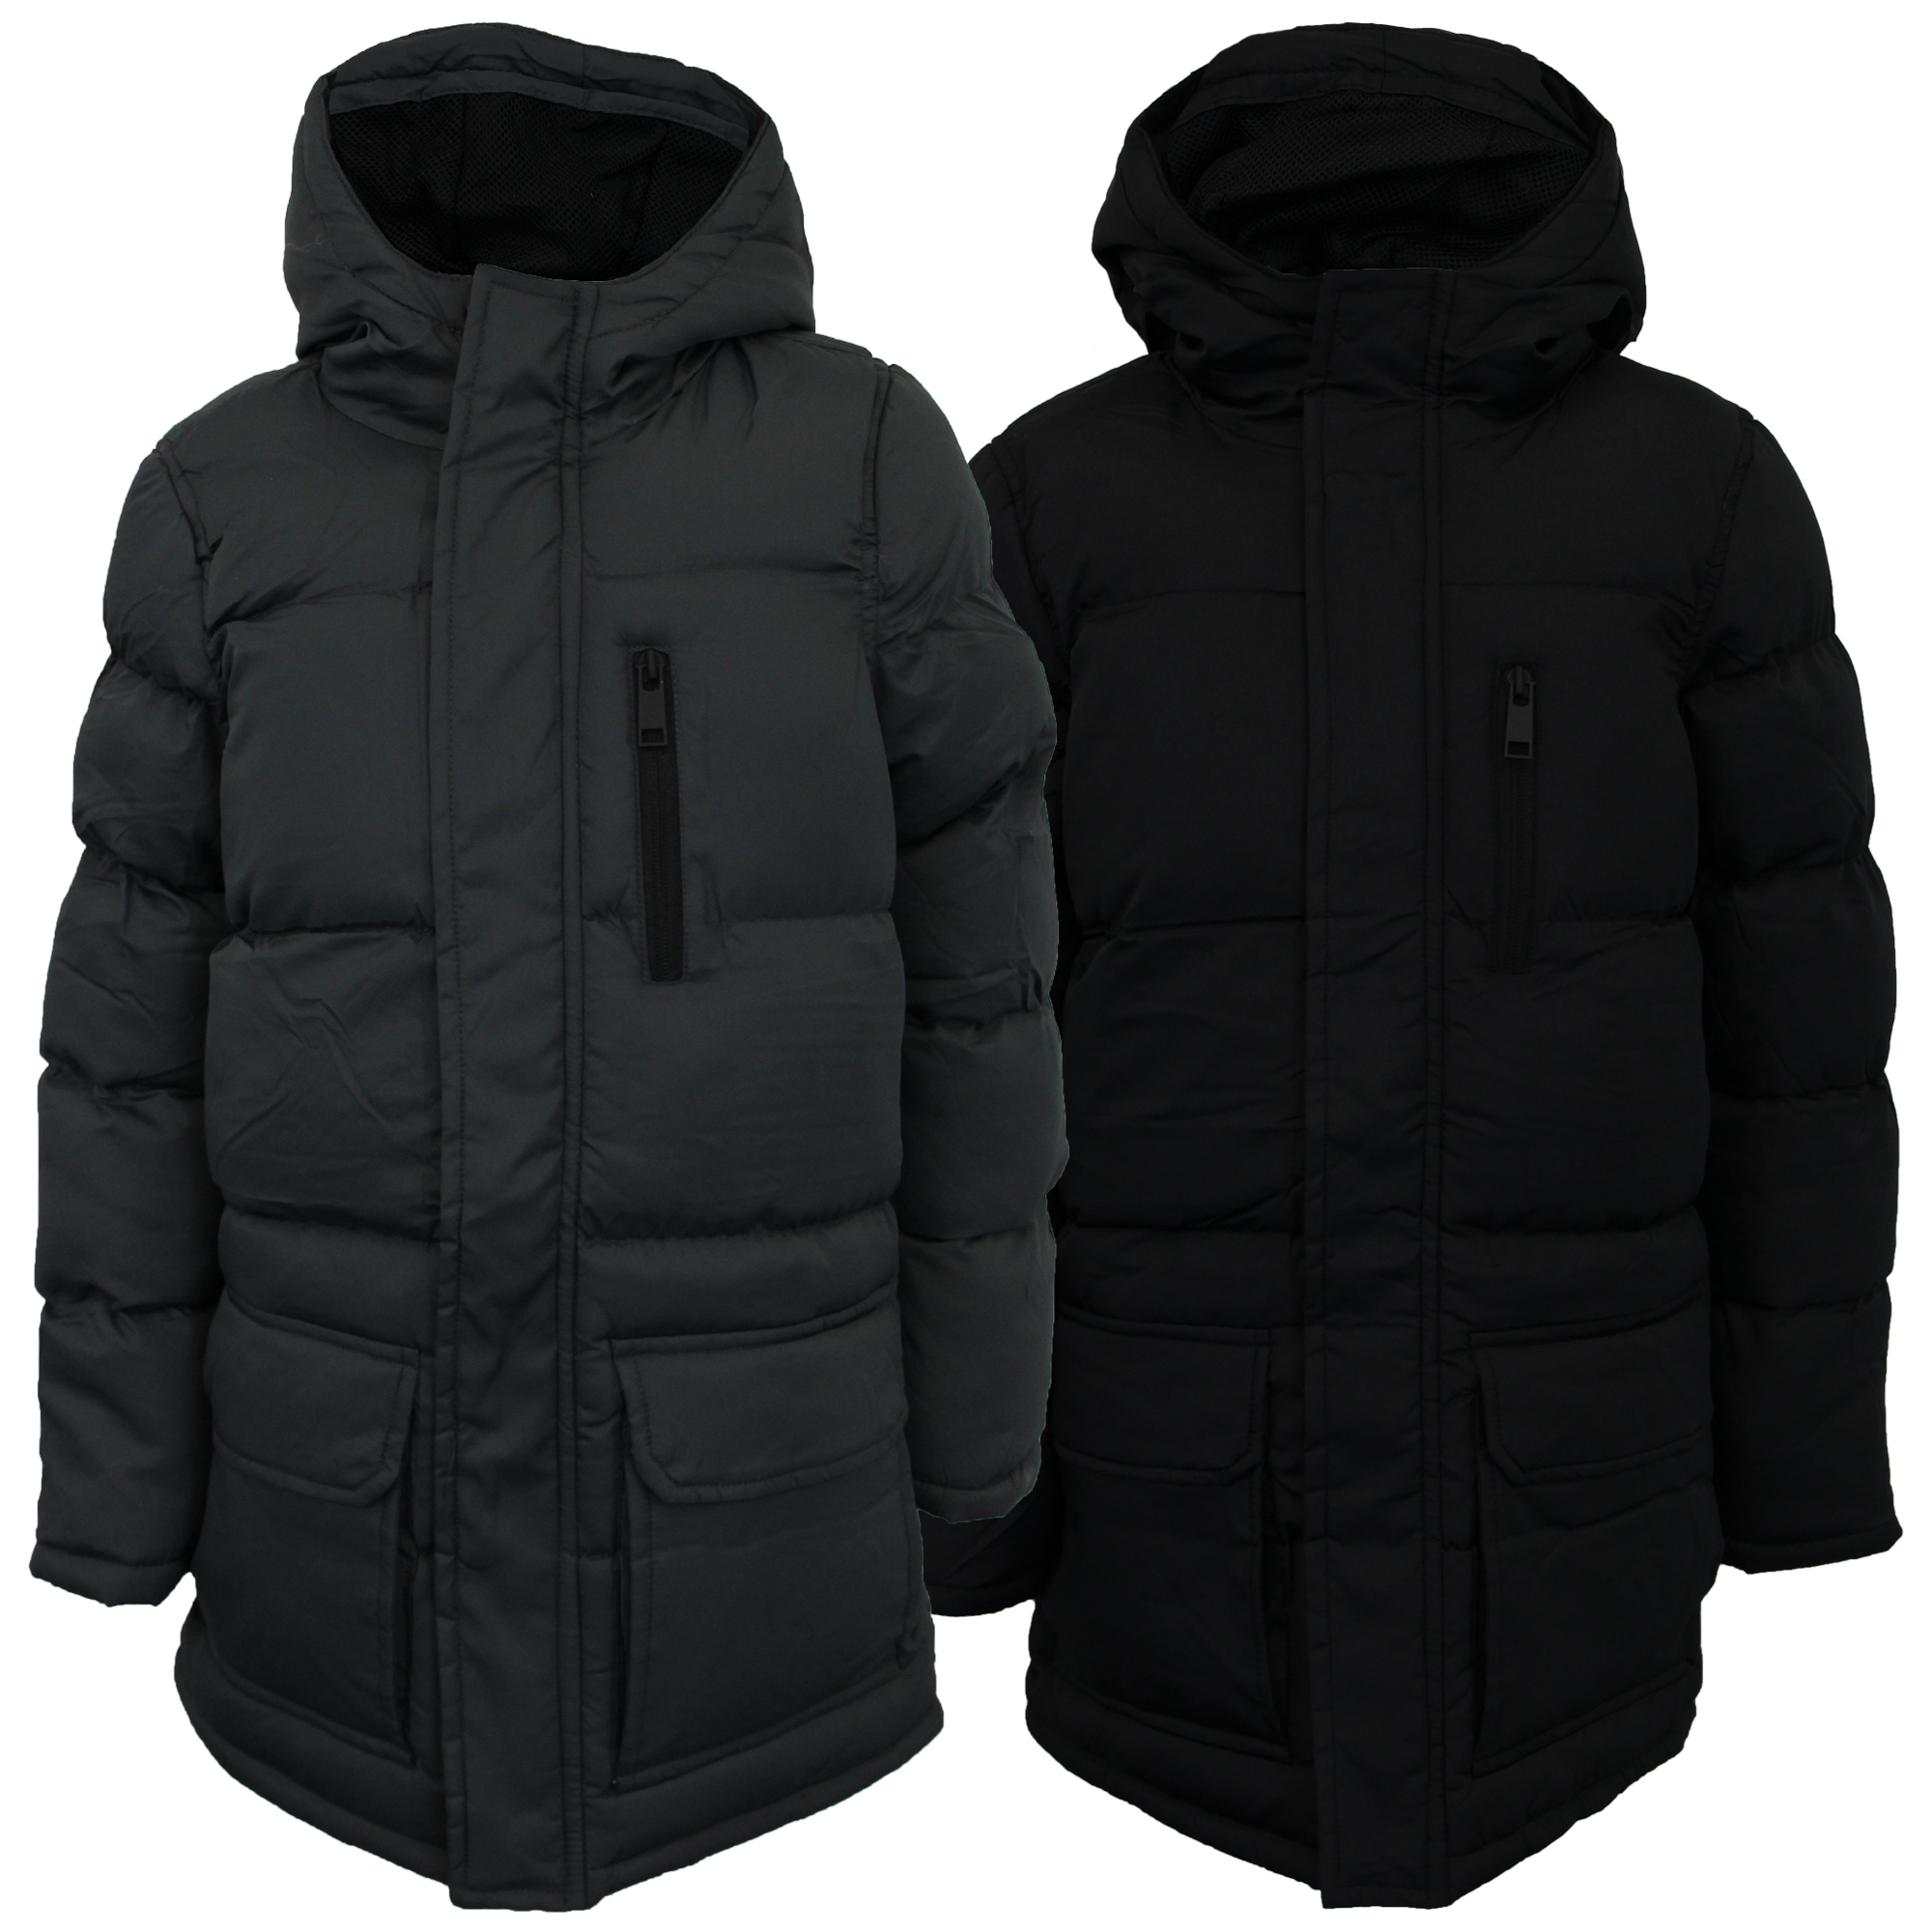 29b7fbcca Boys Parka Jacket Brave Soul Kids Long Coat School Padded Quilted ...